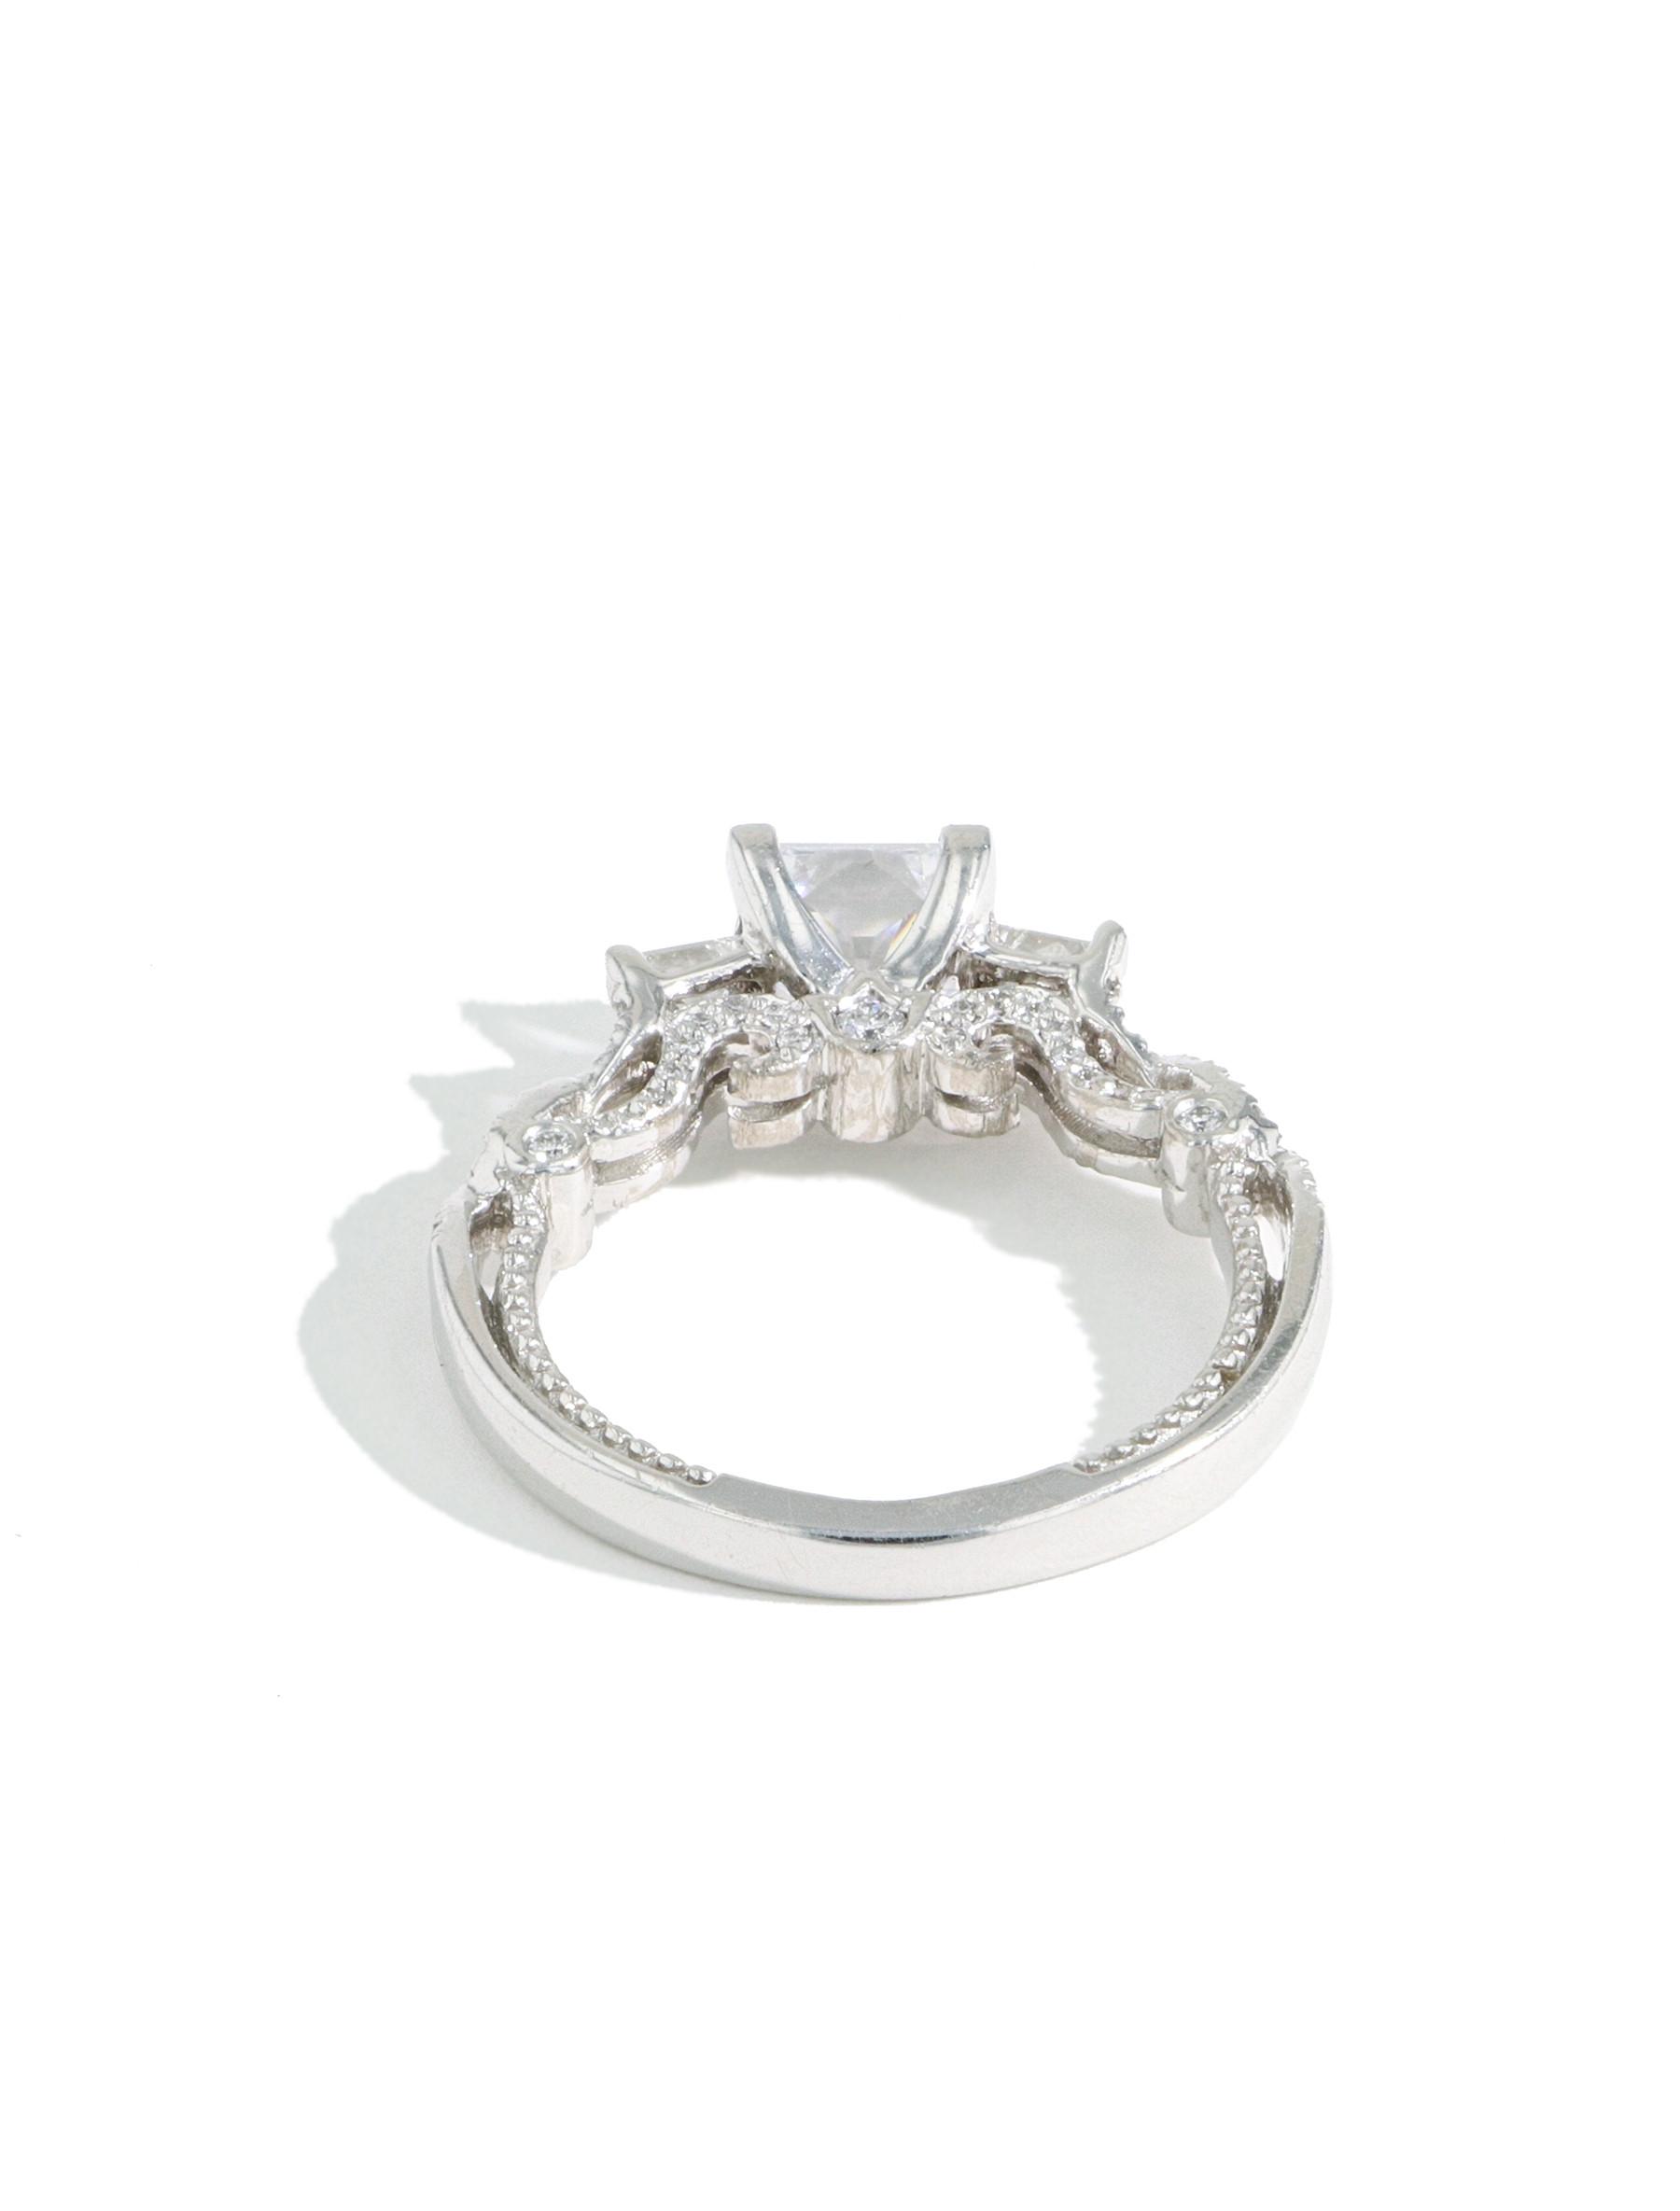 Verragio Insignia Princess Cut Diamond Three Stone Engagement Ring Setting back view